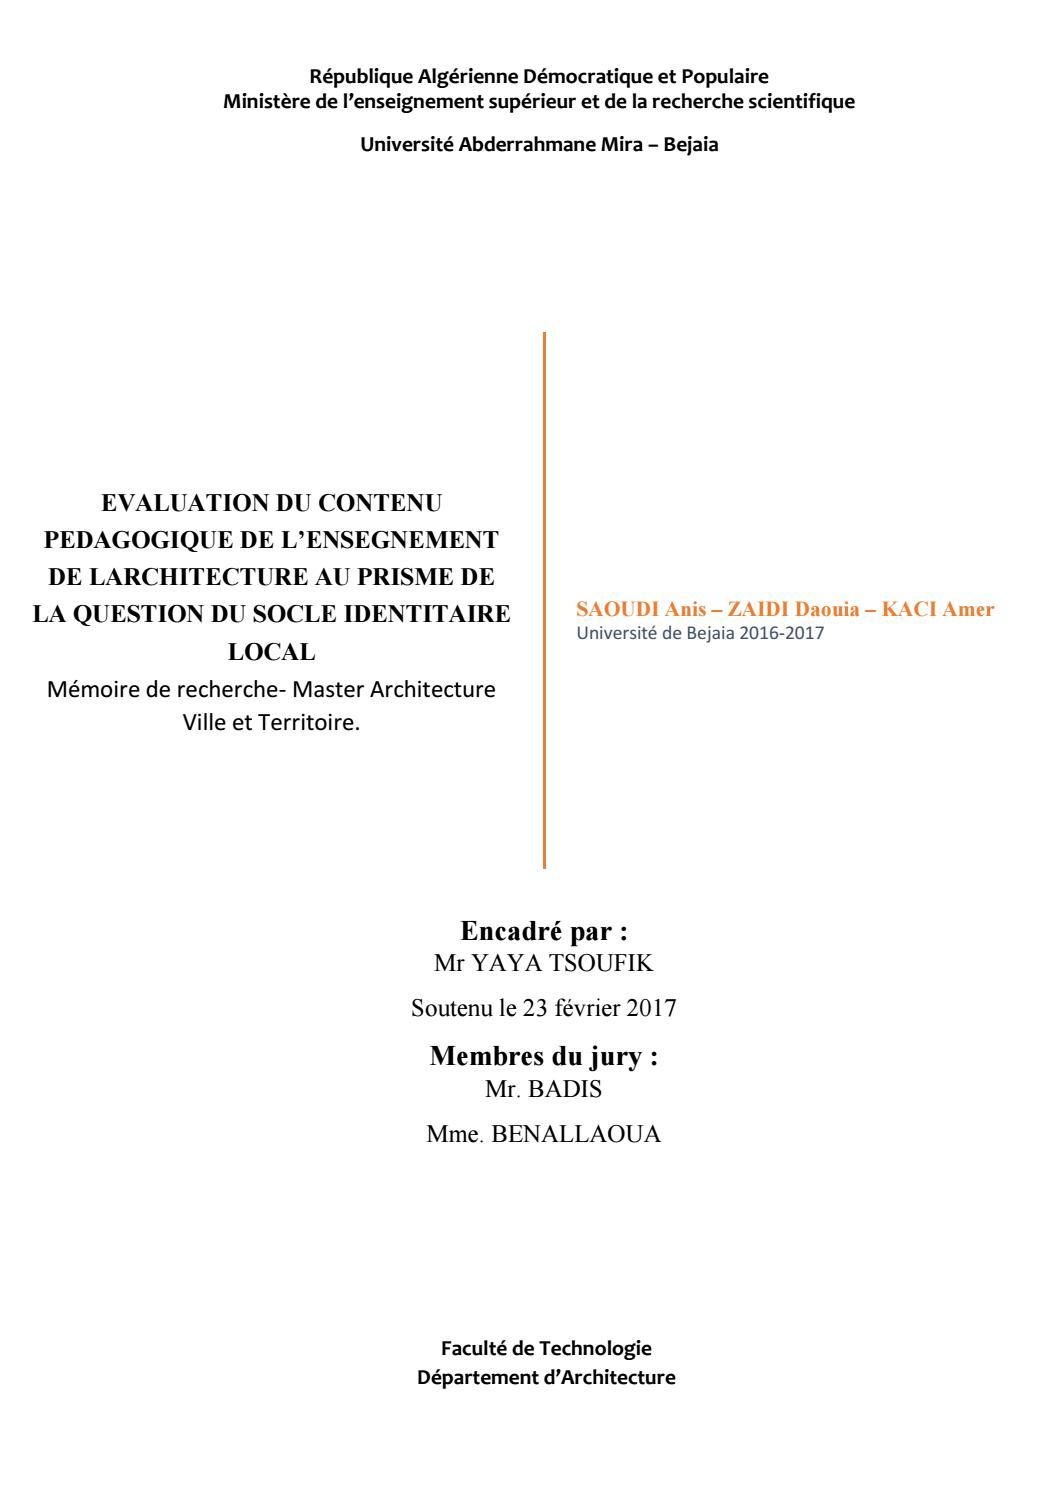 Memoire De Recherche Saoudi Anis By Saoudi Anis - Issuu intérieur Mot Croiser